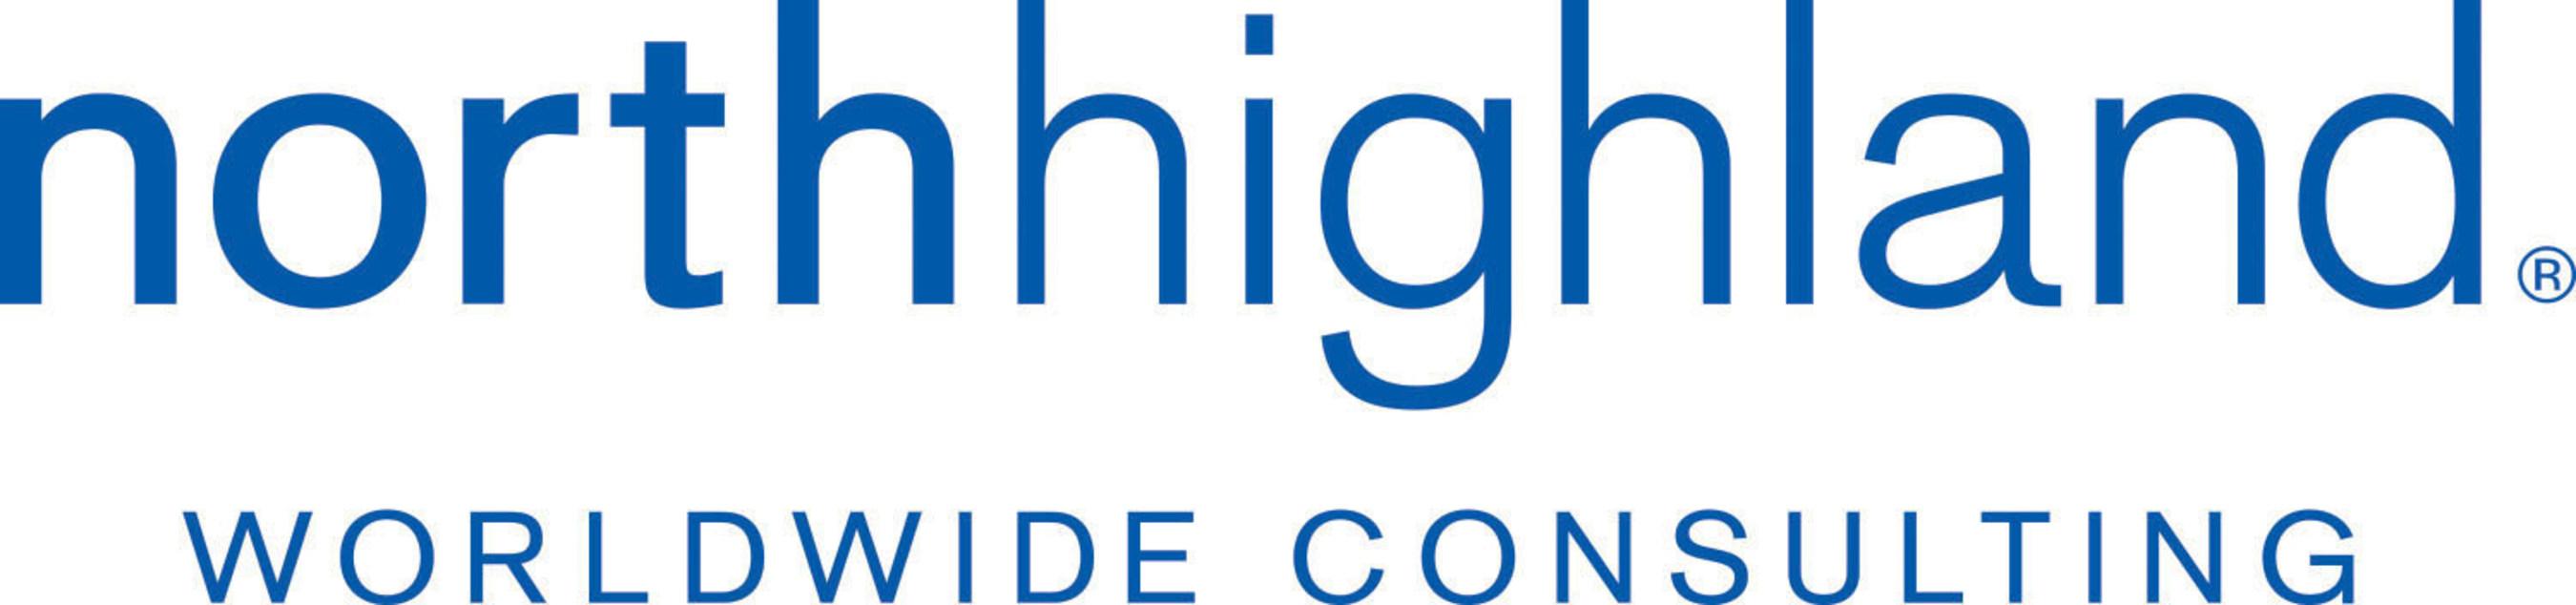 North Highland logo.